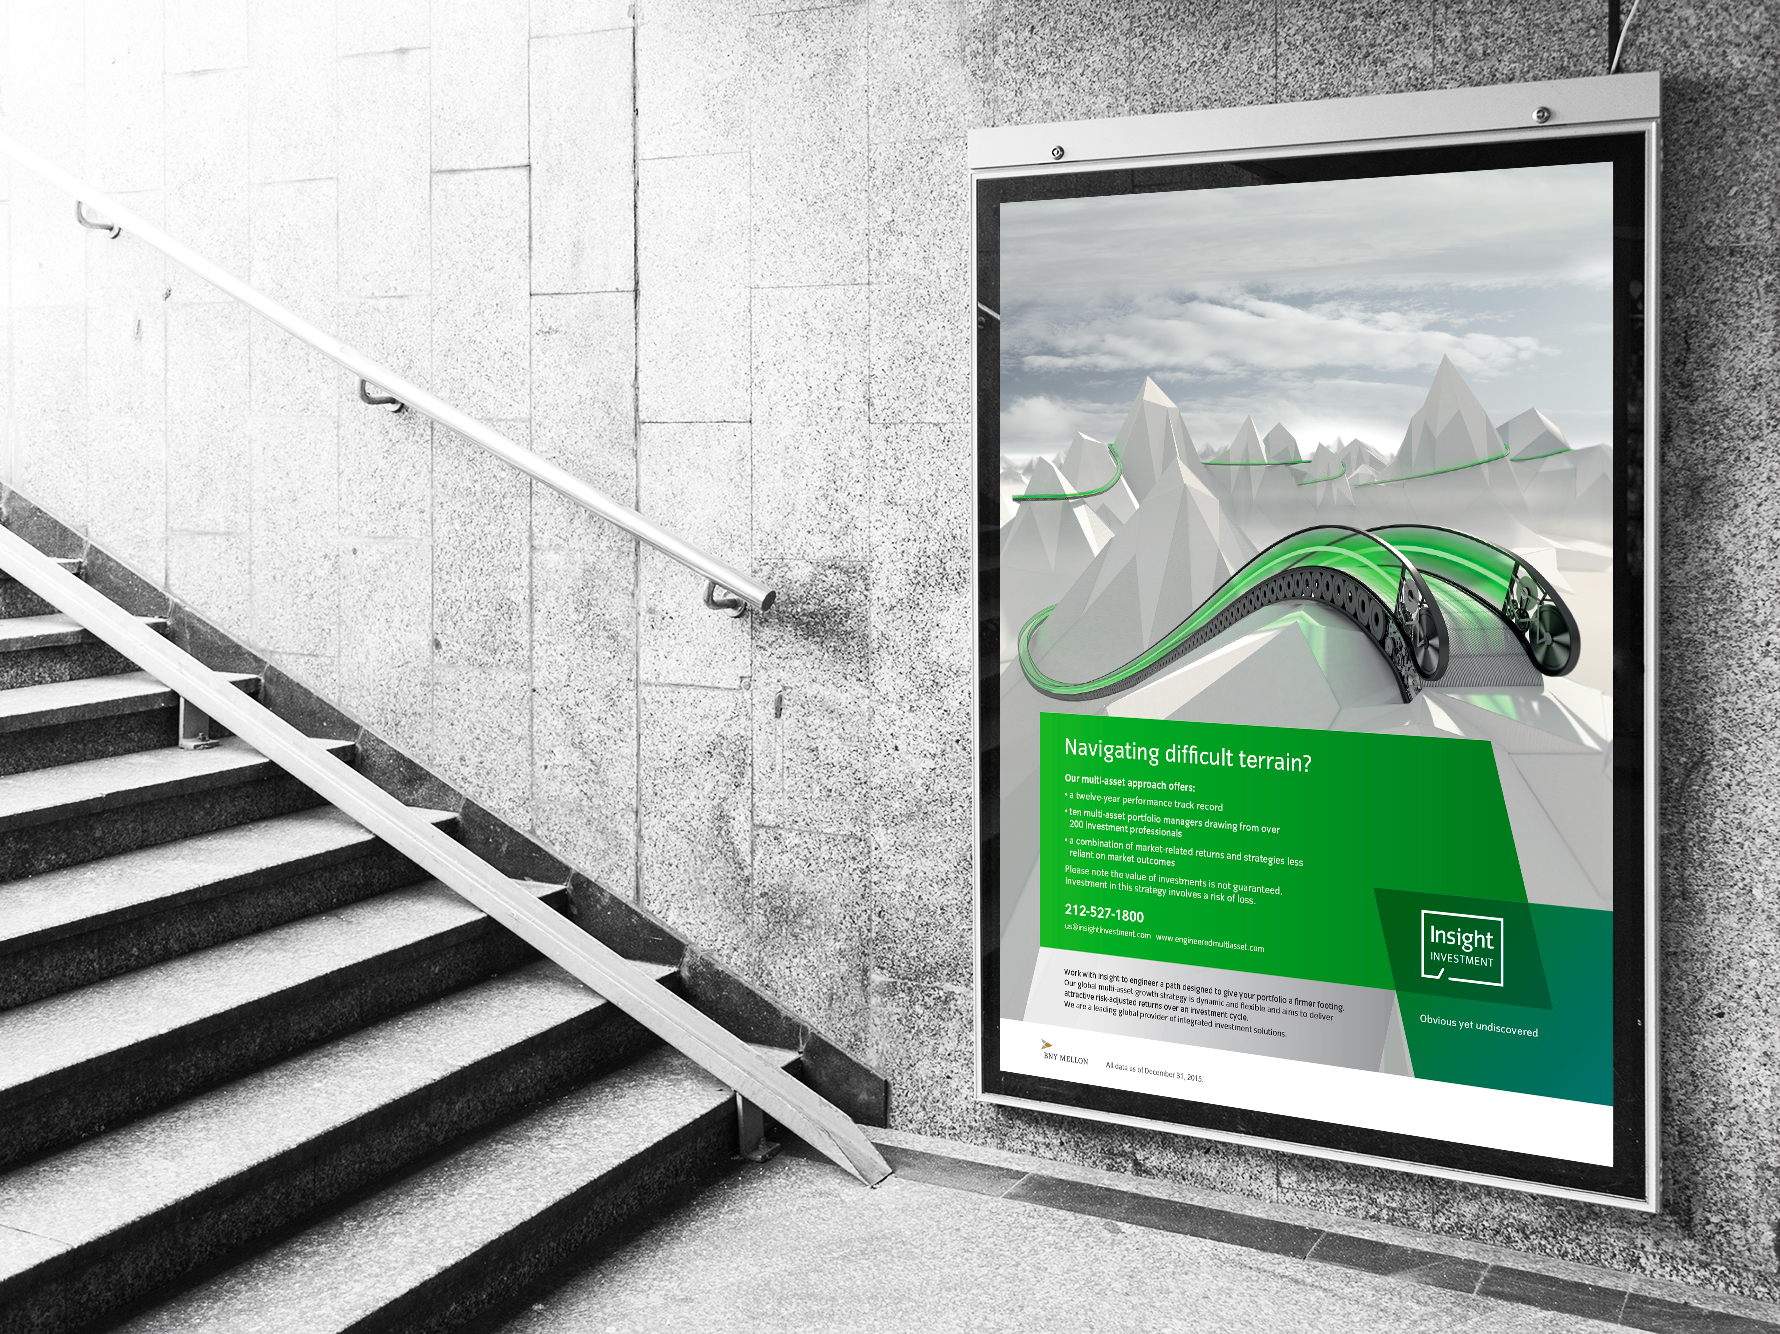 insight investment escalator campaign billboard image